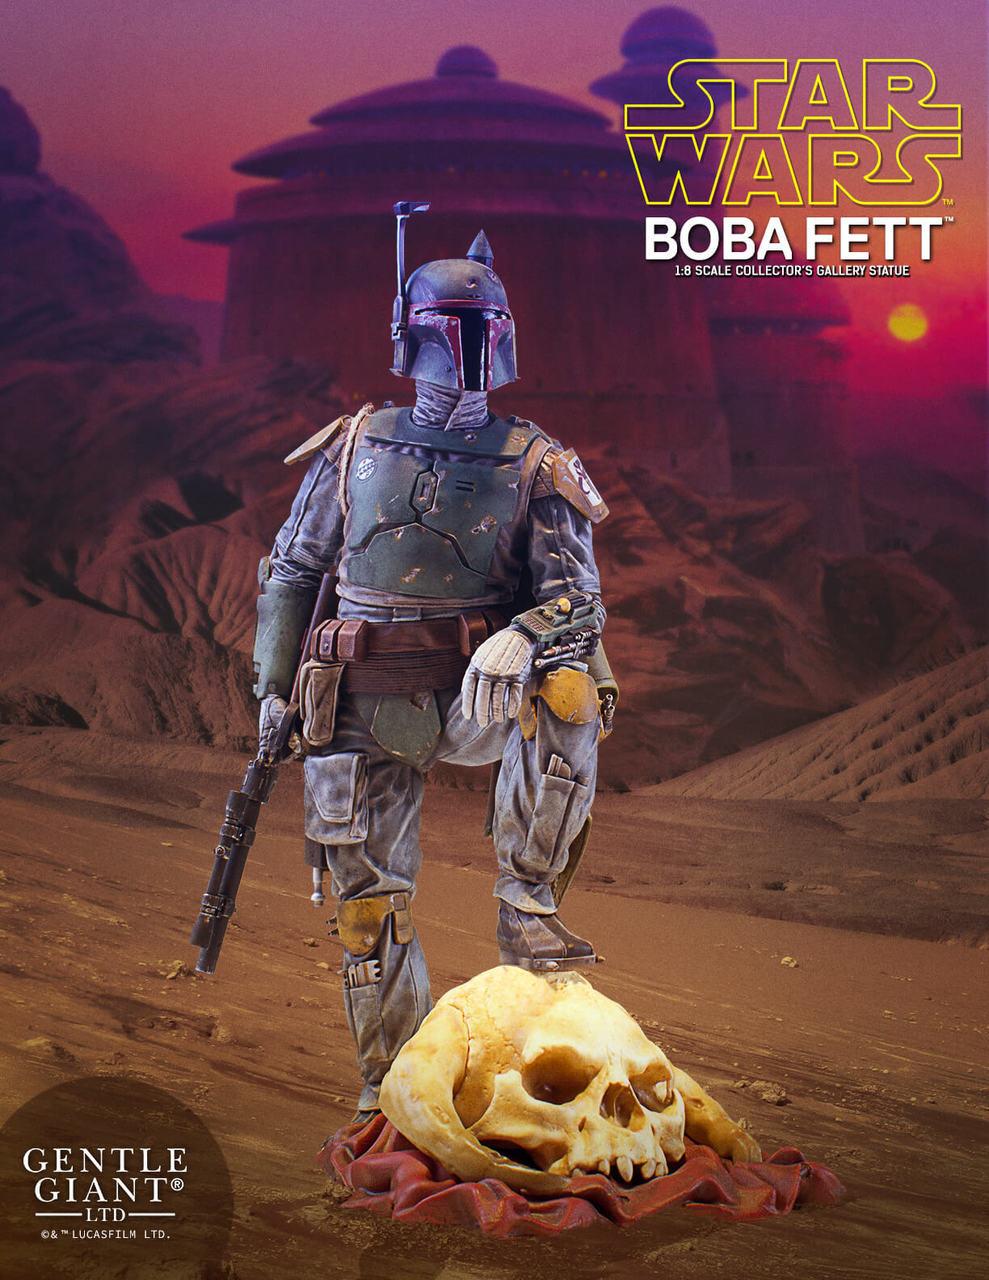 ROTJ GGLTD Boba Fett Statue 1